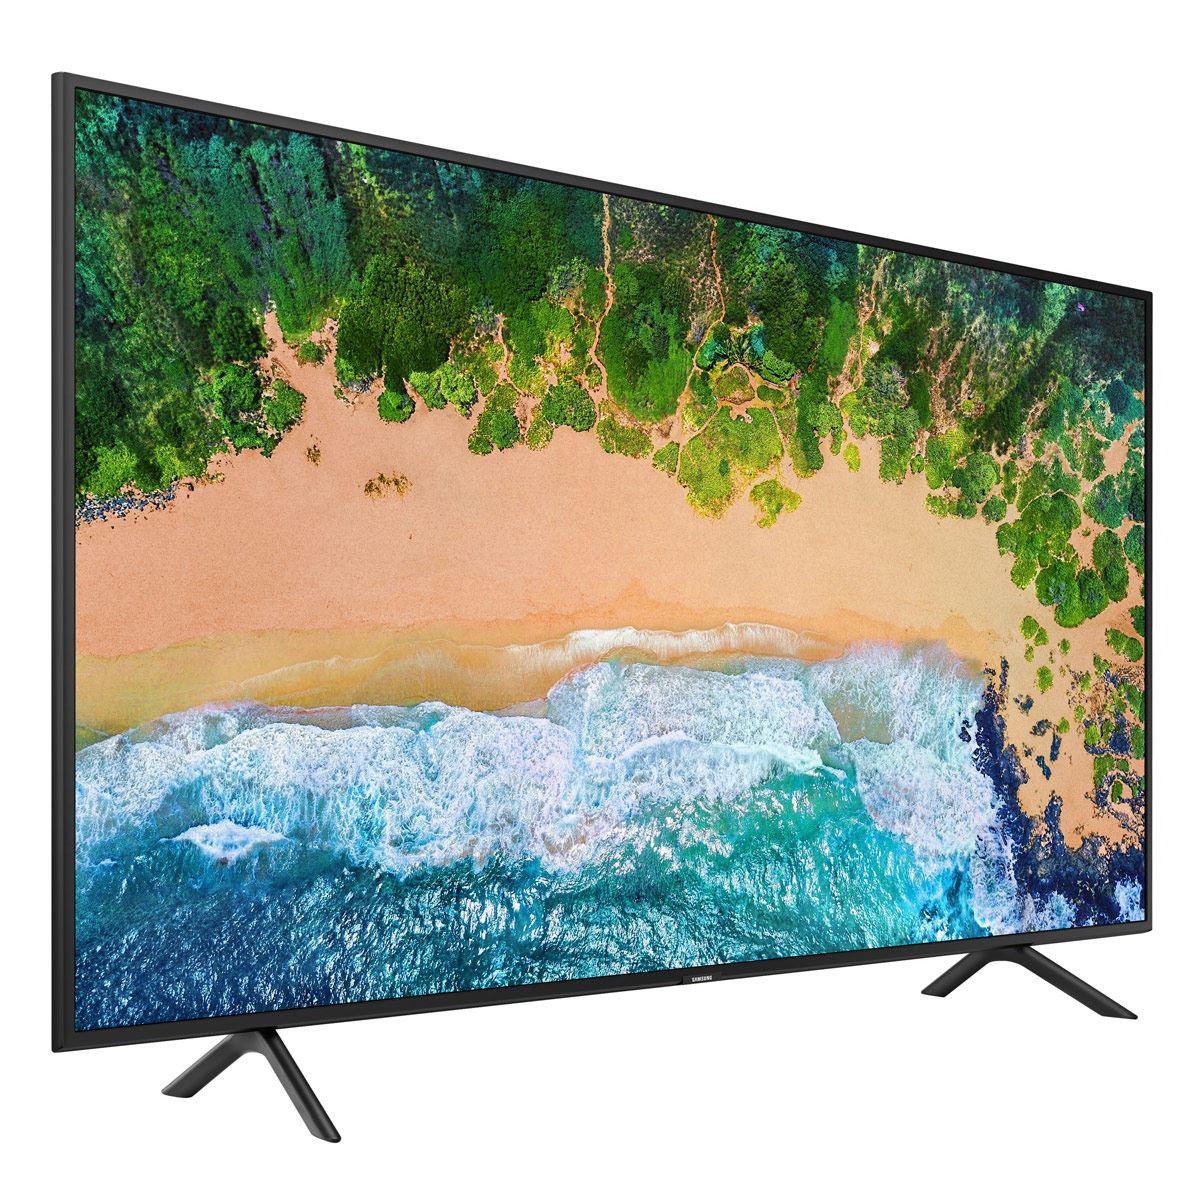 "Pantalla Samsung 43"" UHD 4K Smart TV UN43NU7100FXZ"